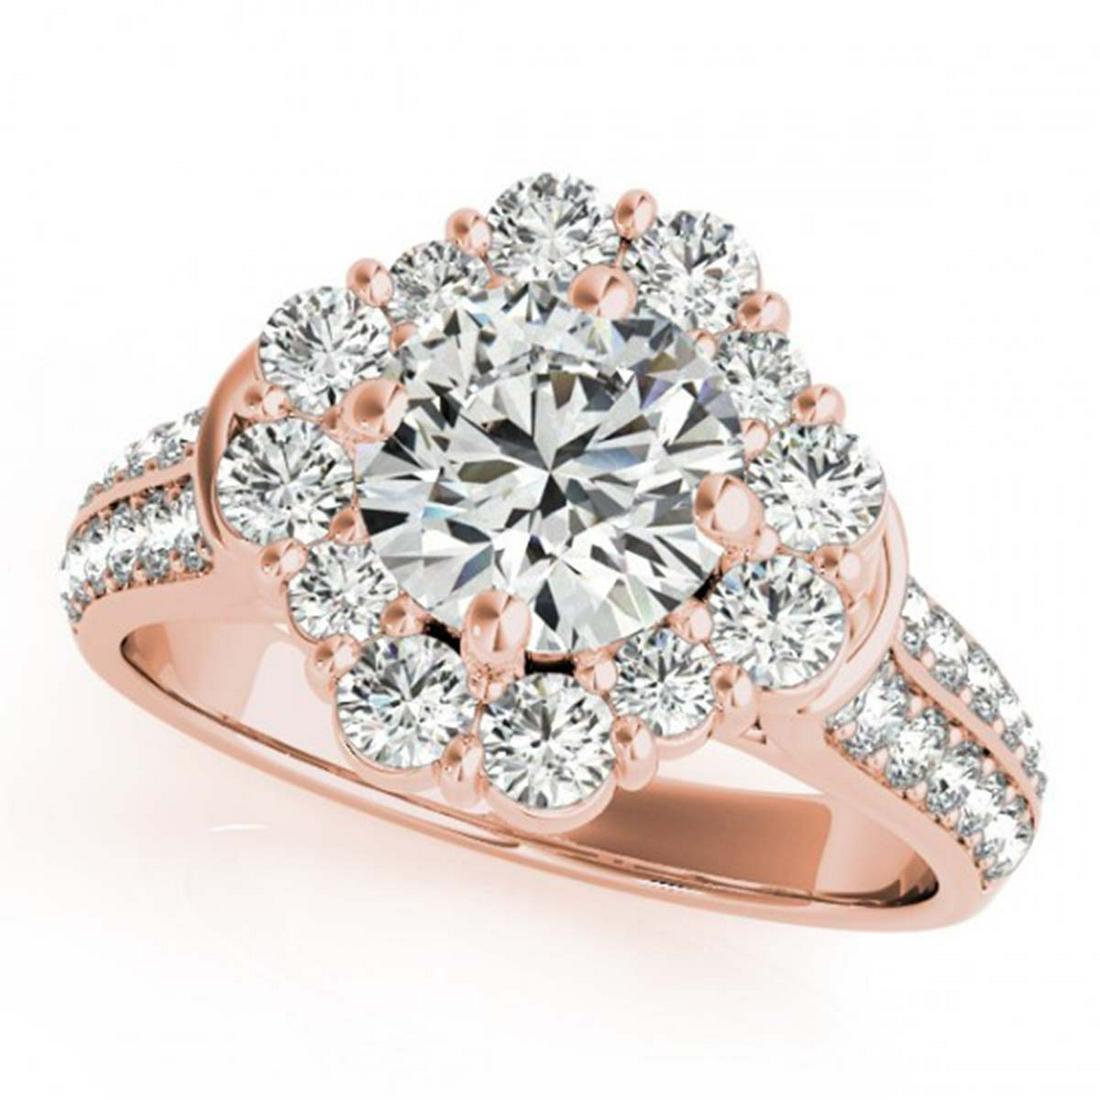 2.81 ctw VS/SI Diamond Solitaire Halo Ring 14K Rose